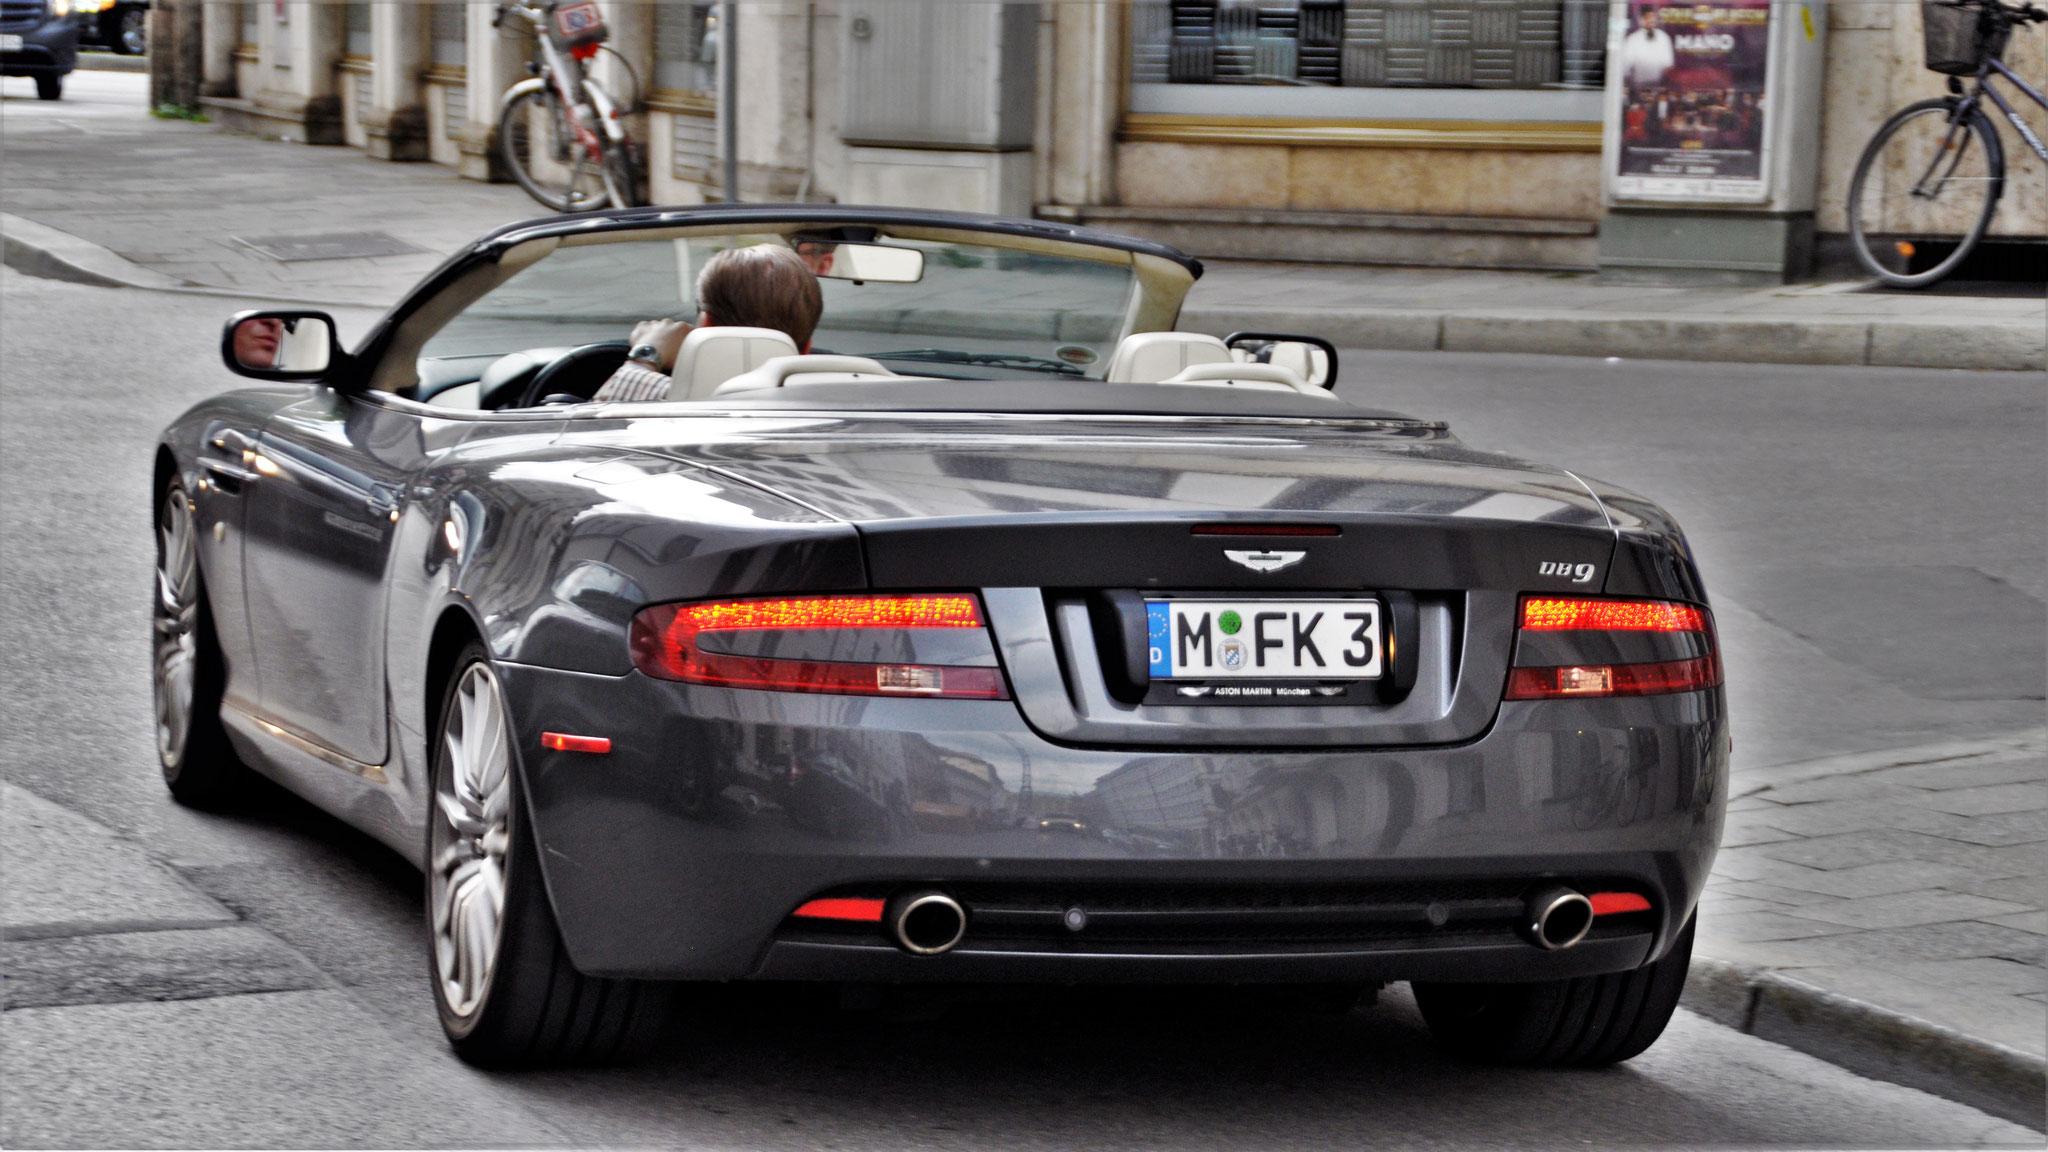 Aston Martin DB9 Volante - M-FK-3